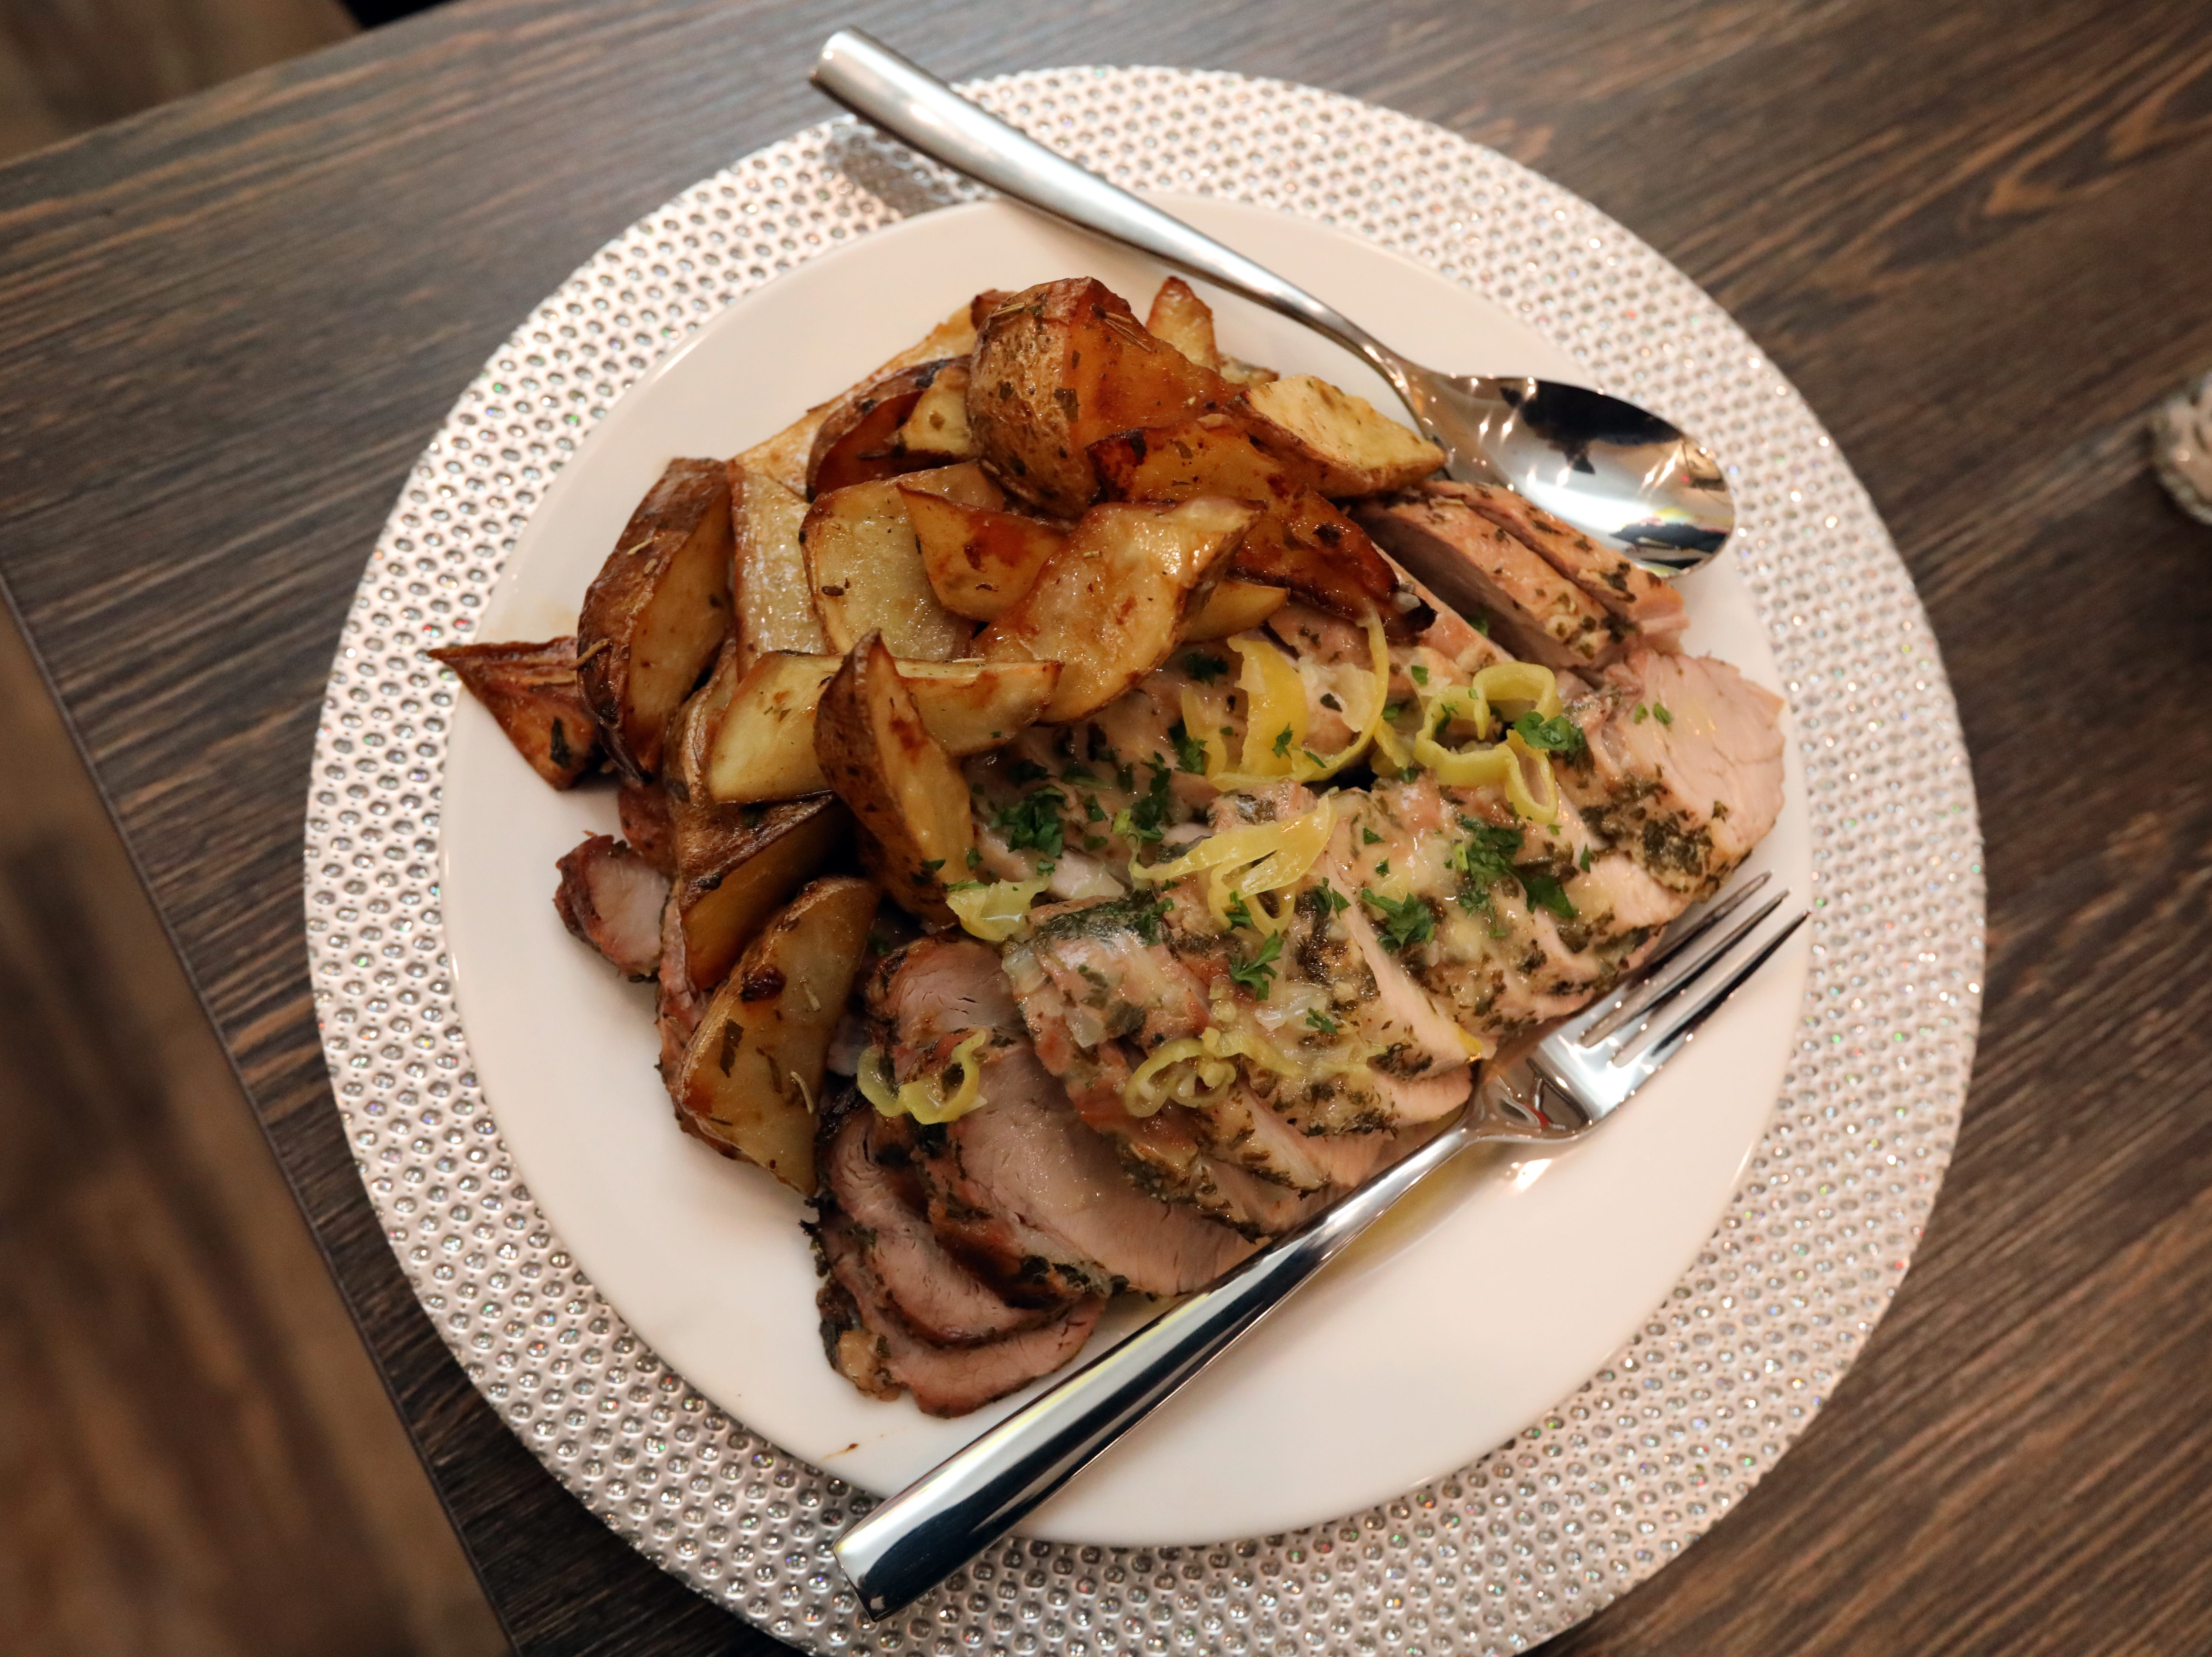 Rosemary pork tenderloin at Joe and Joe in Nyack Nov. 16, 2018.